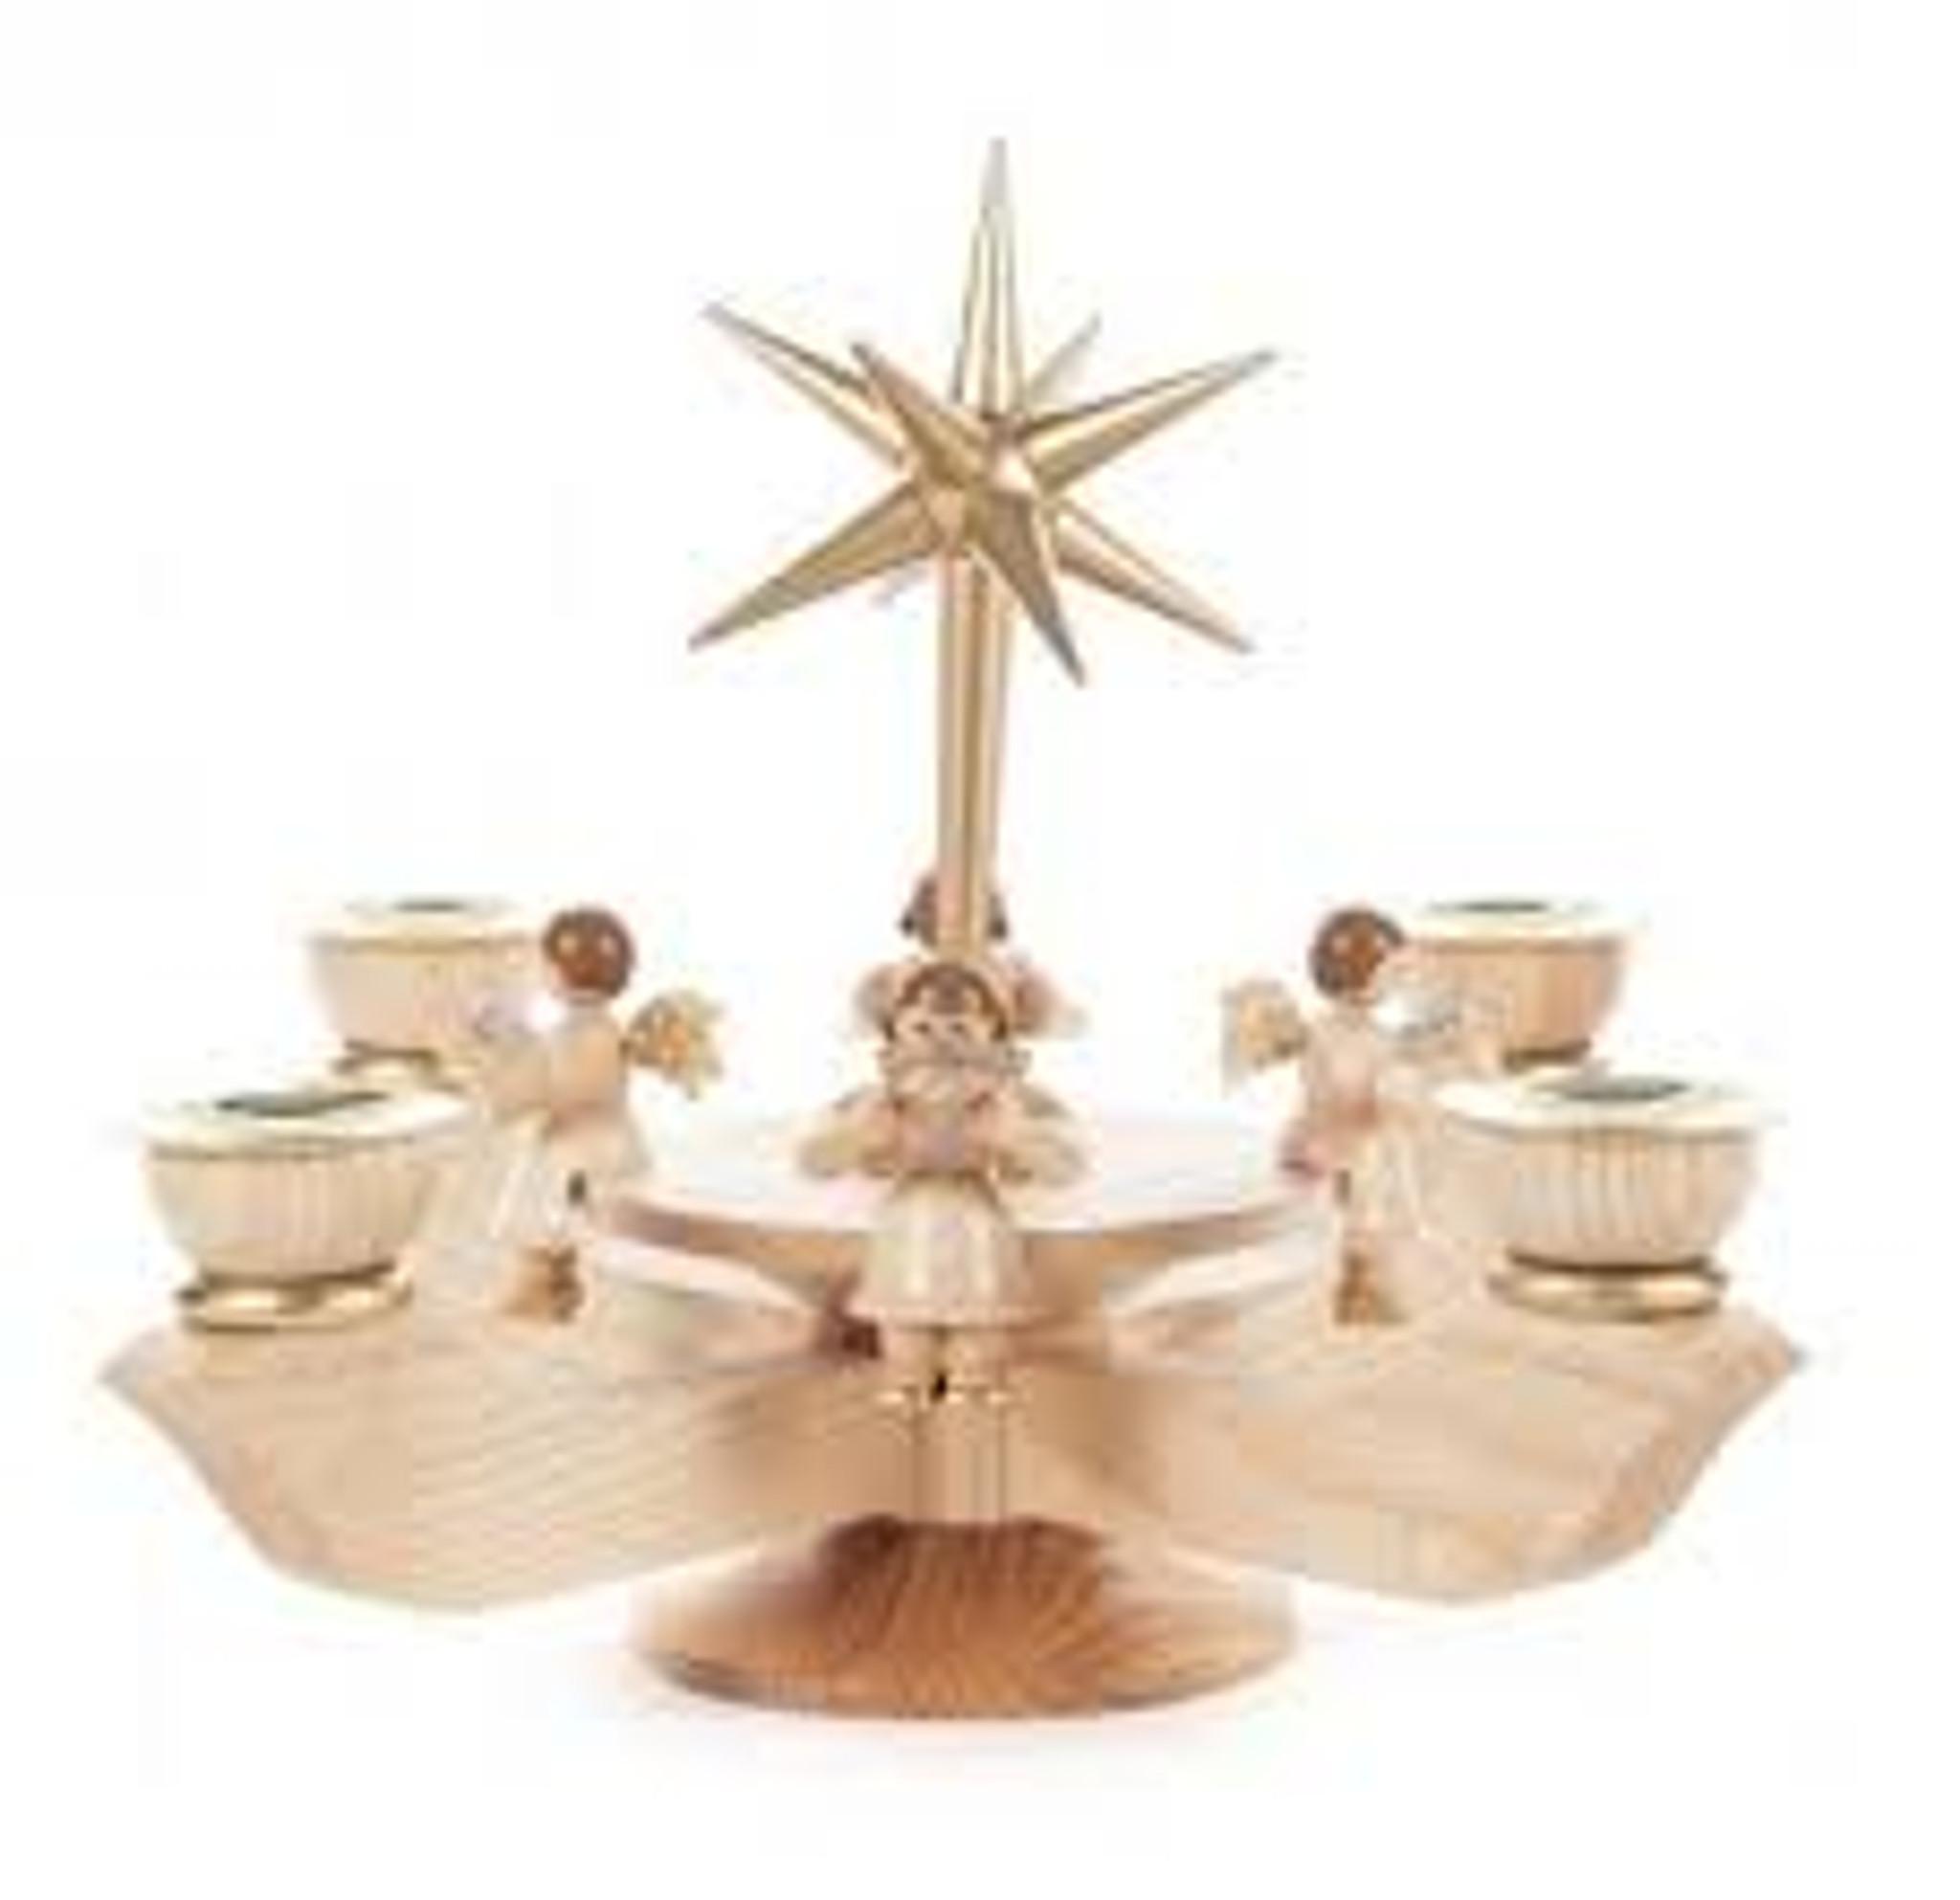 Dregeno Erzgebirge Advent Candle Holder Singing Angels Small Erzgebirge Pyramids Canada Ava S Appletree